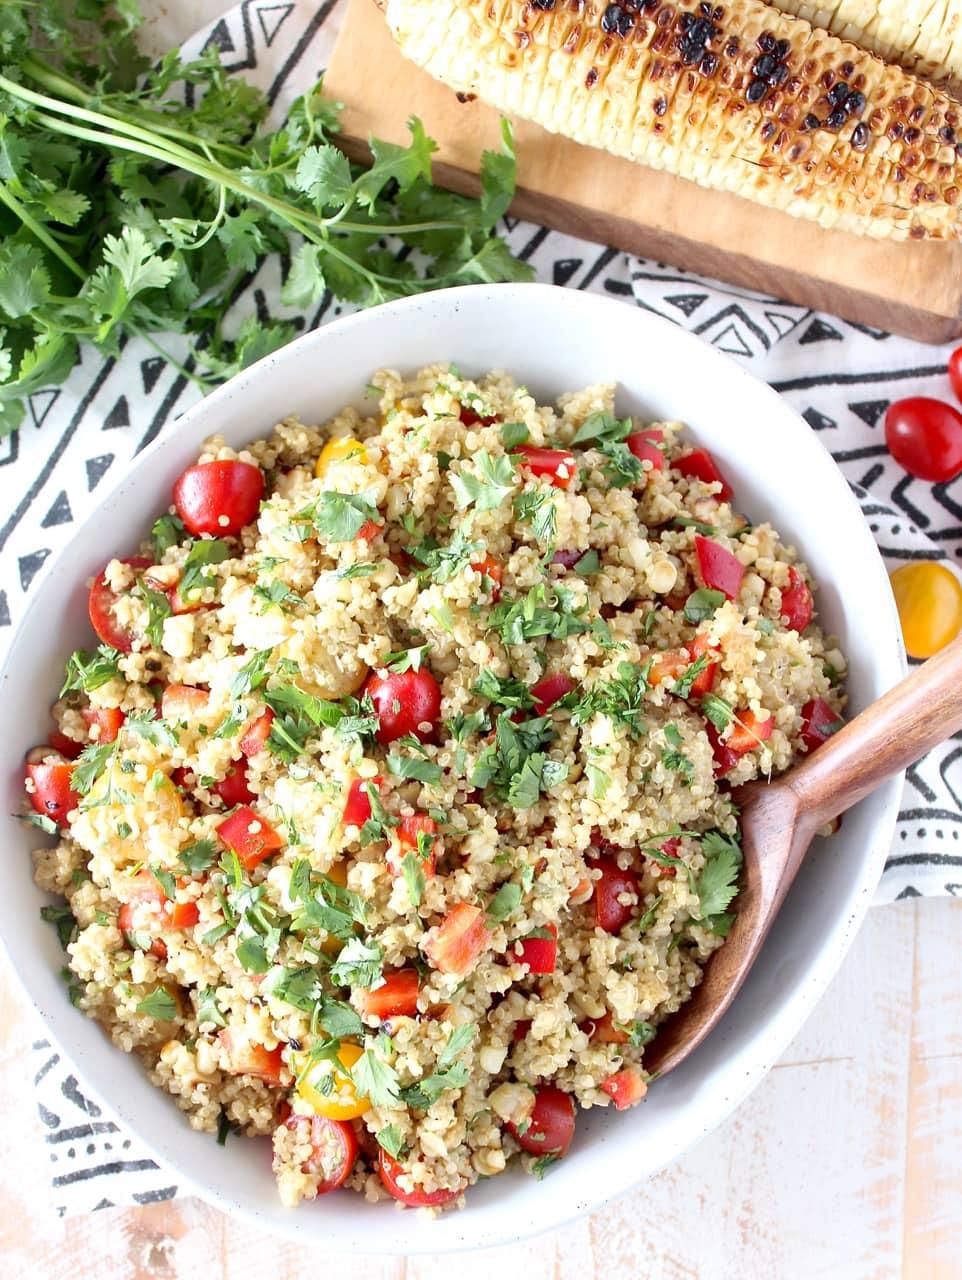 Vegan Quinoa Corn Salad with Avocado Dressing